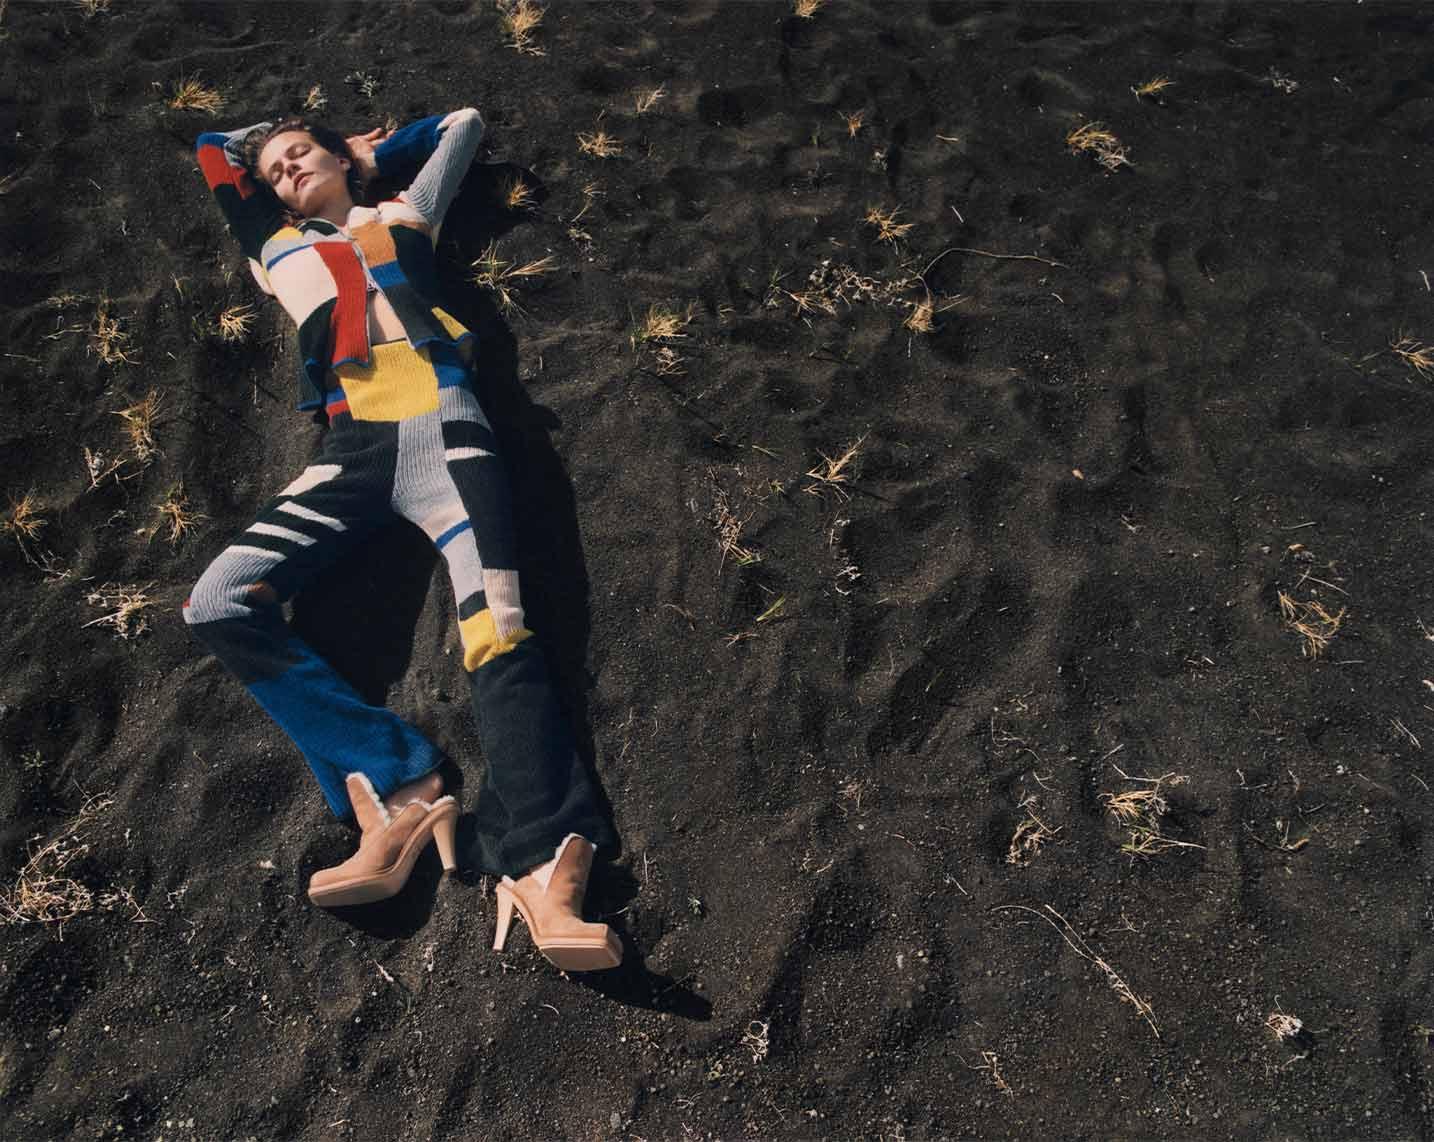 Woman lying on ground wearing Eckhaus Latta Chestnut heels.